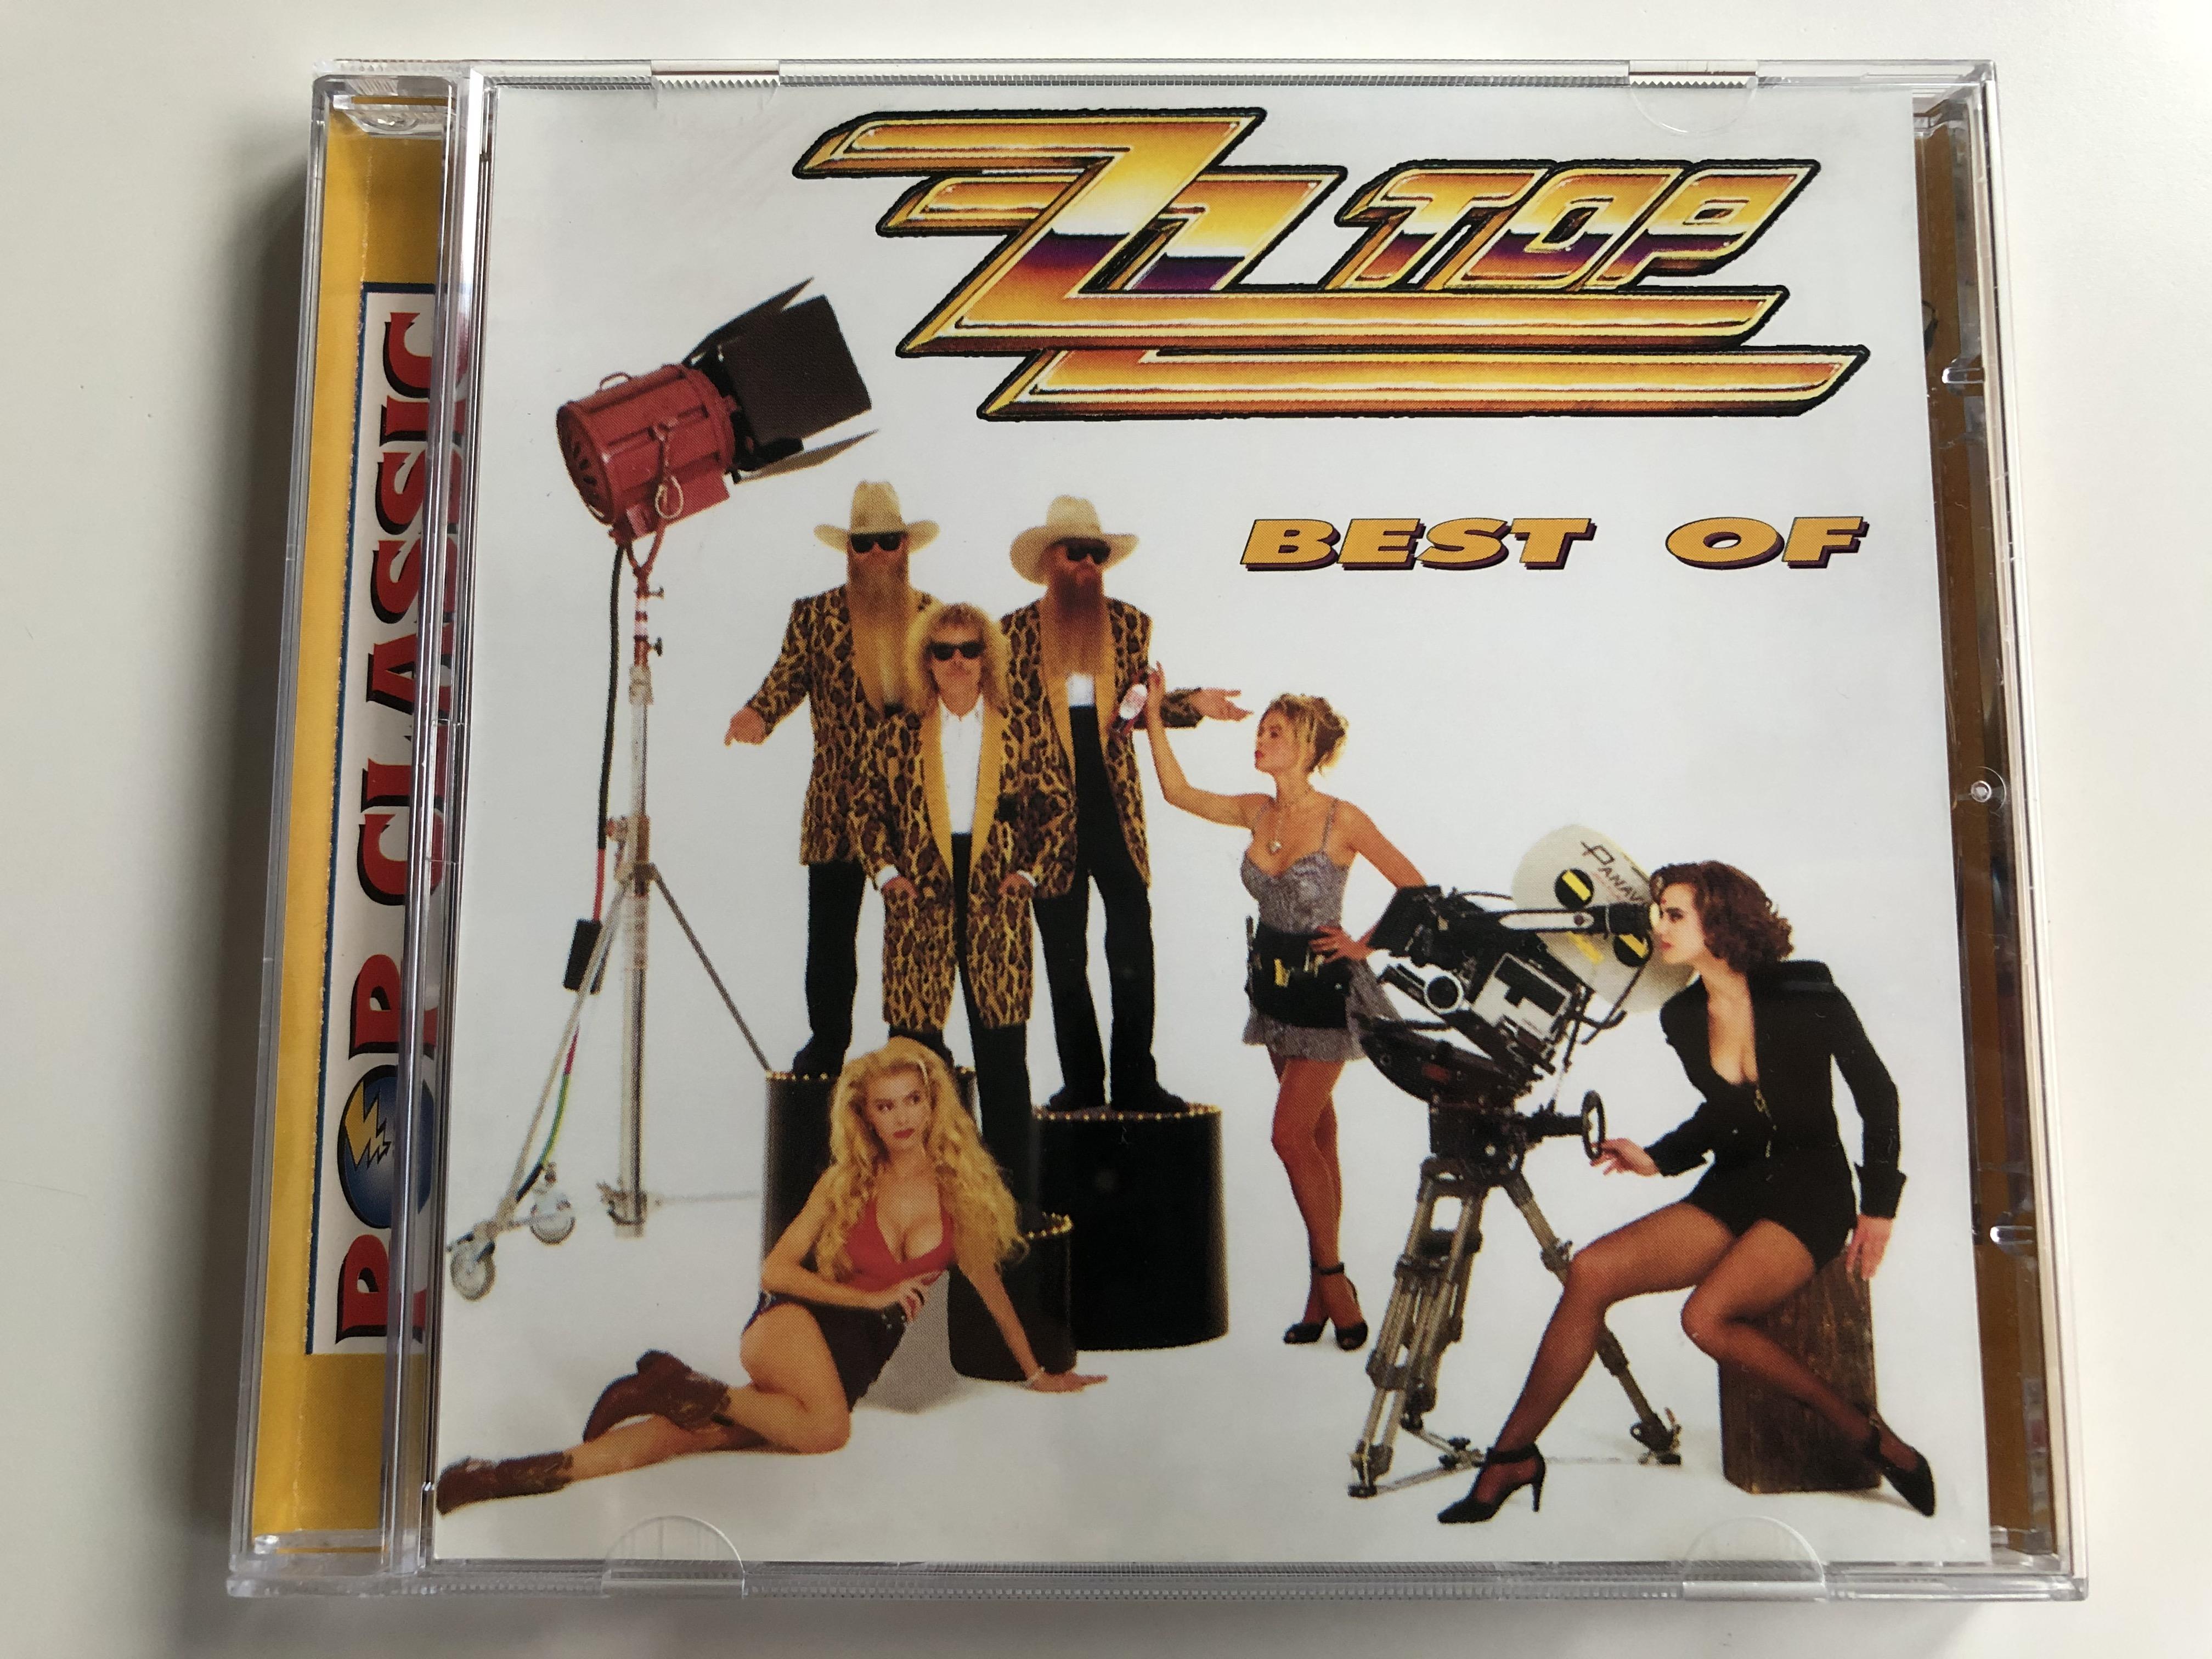 zz-top-best-of-pop-classic-euroton-audio-cd-eucd-0074-1-.jpg